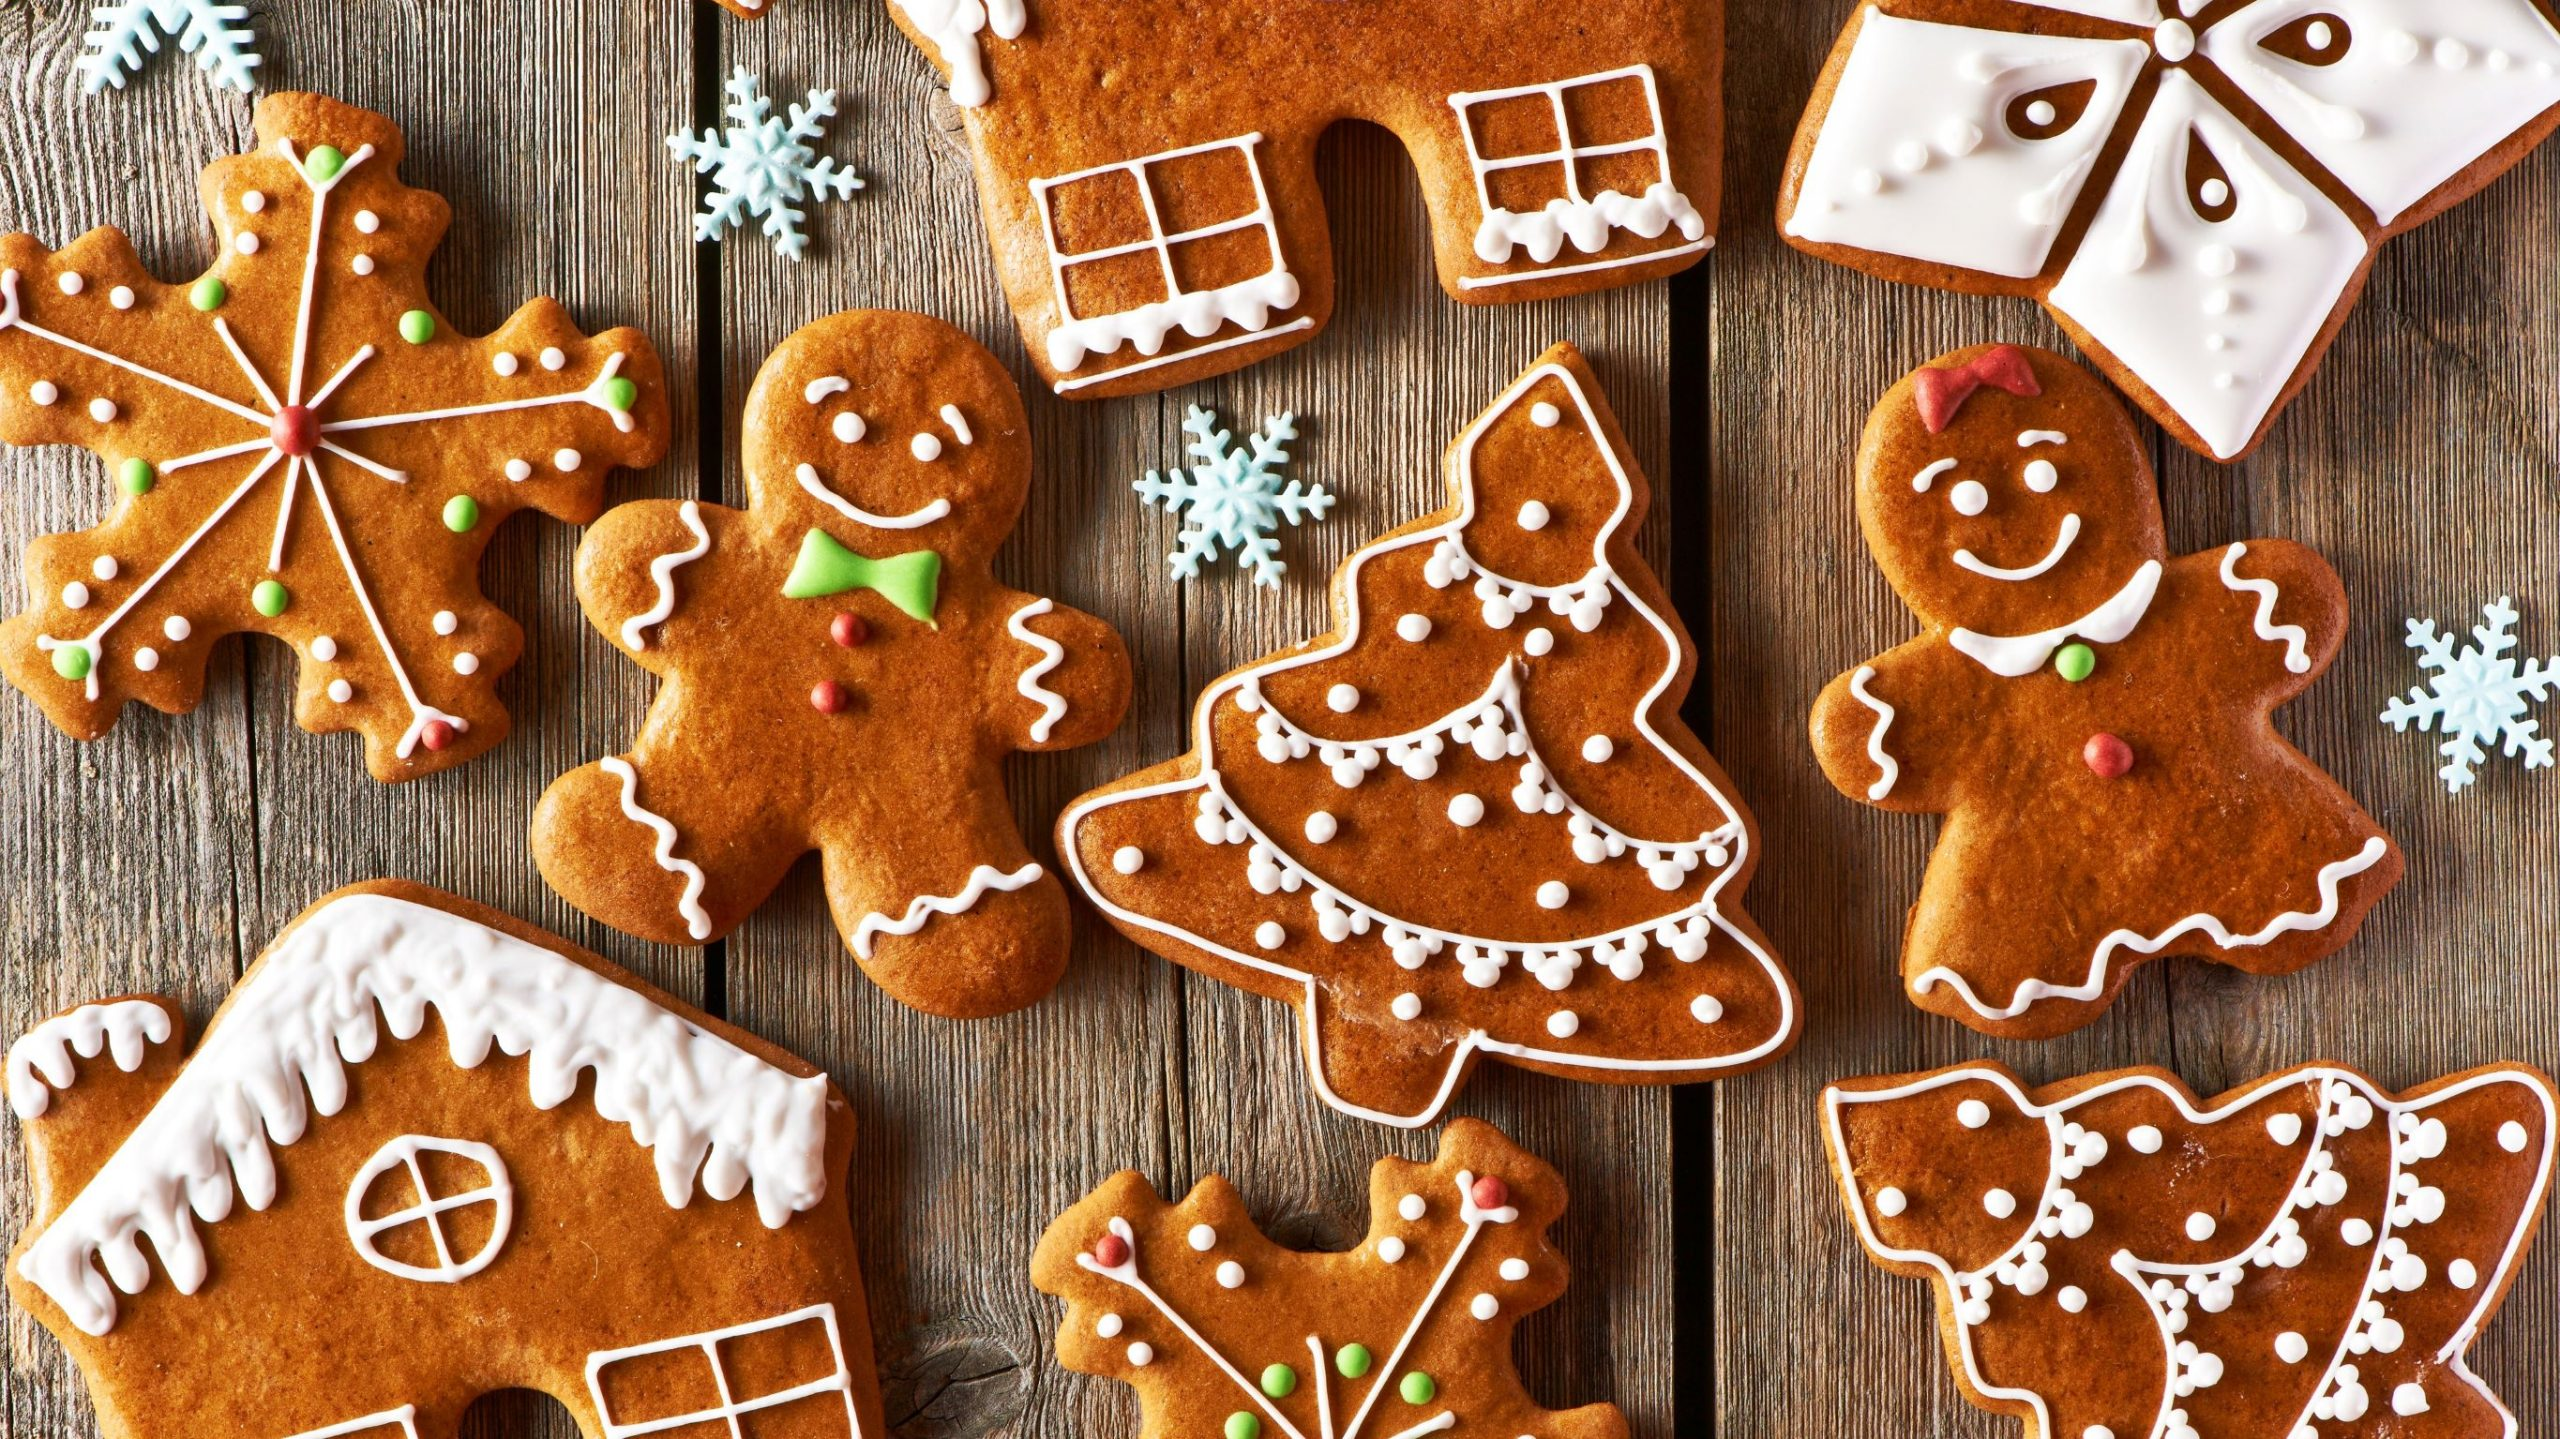 Konditor: Lav dejen nu og få gudegode honninghjerter til jul